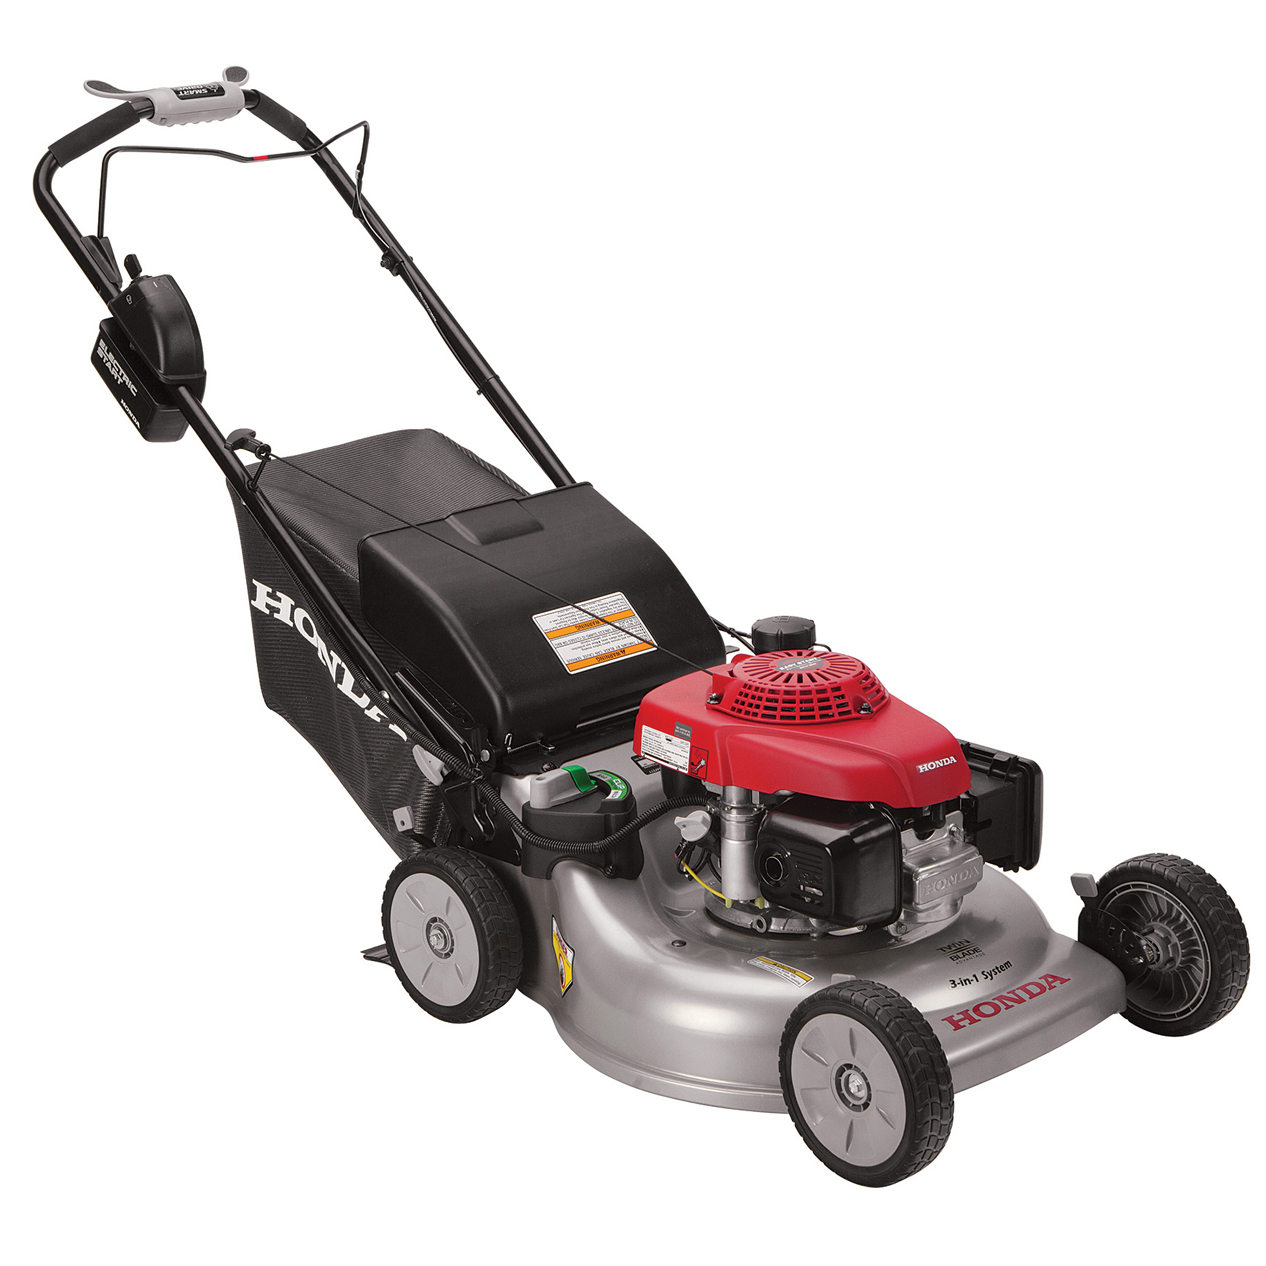 Honda 21'' 3-in-1 Self Propelled Electric Start Lawn Mower Lawnmower-  HRR216VLA